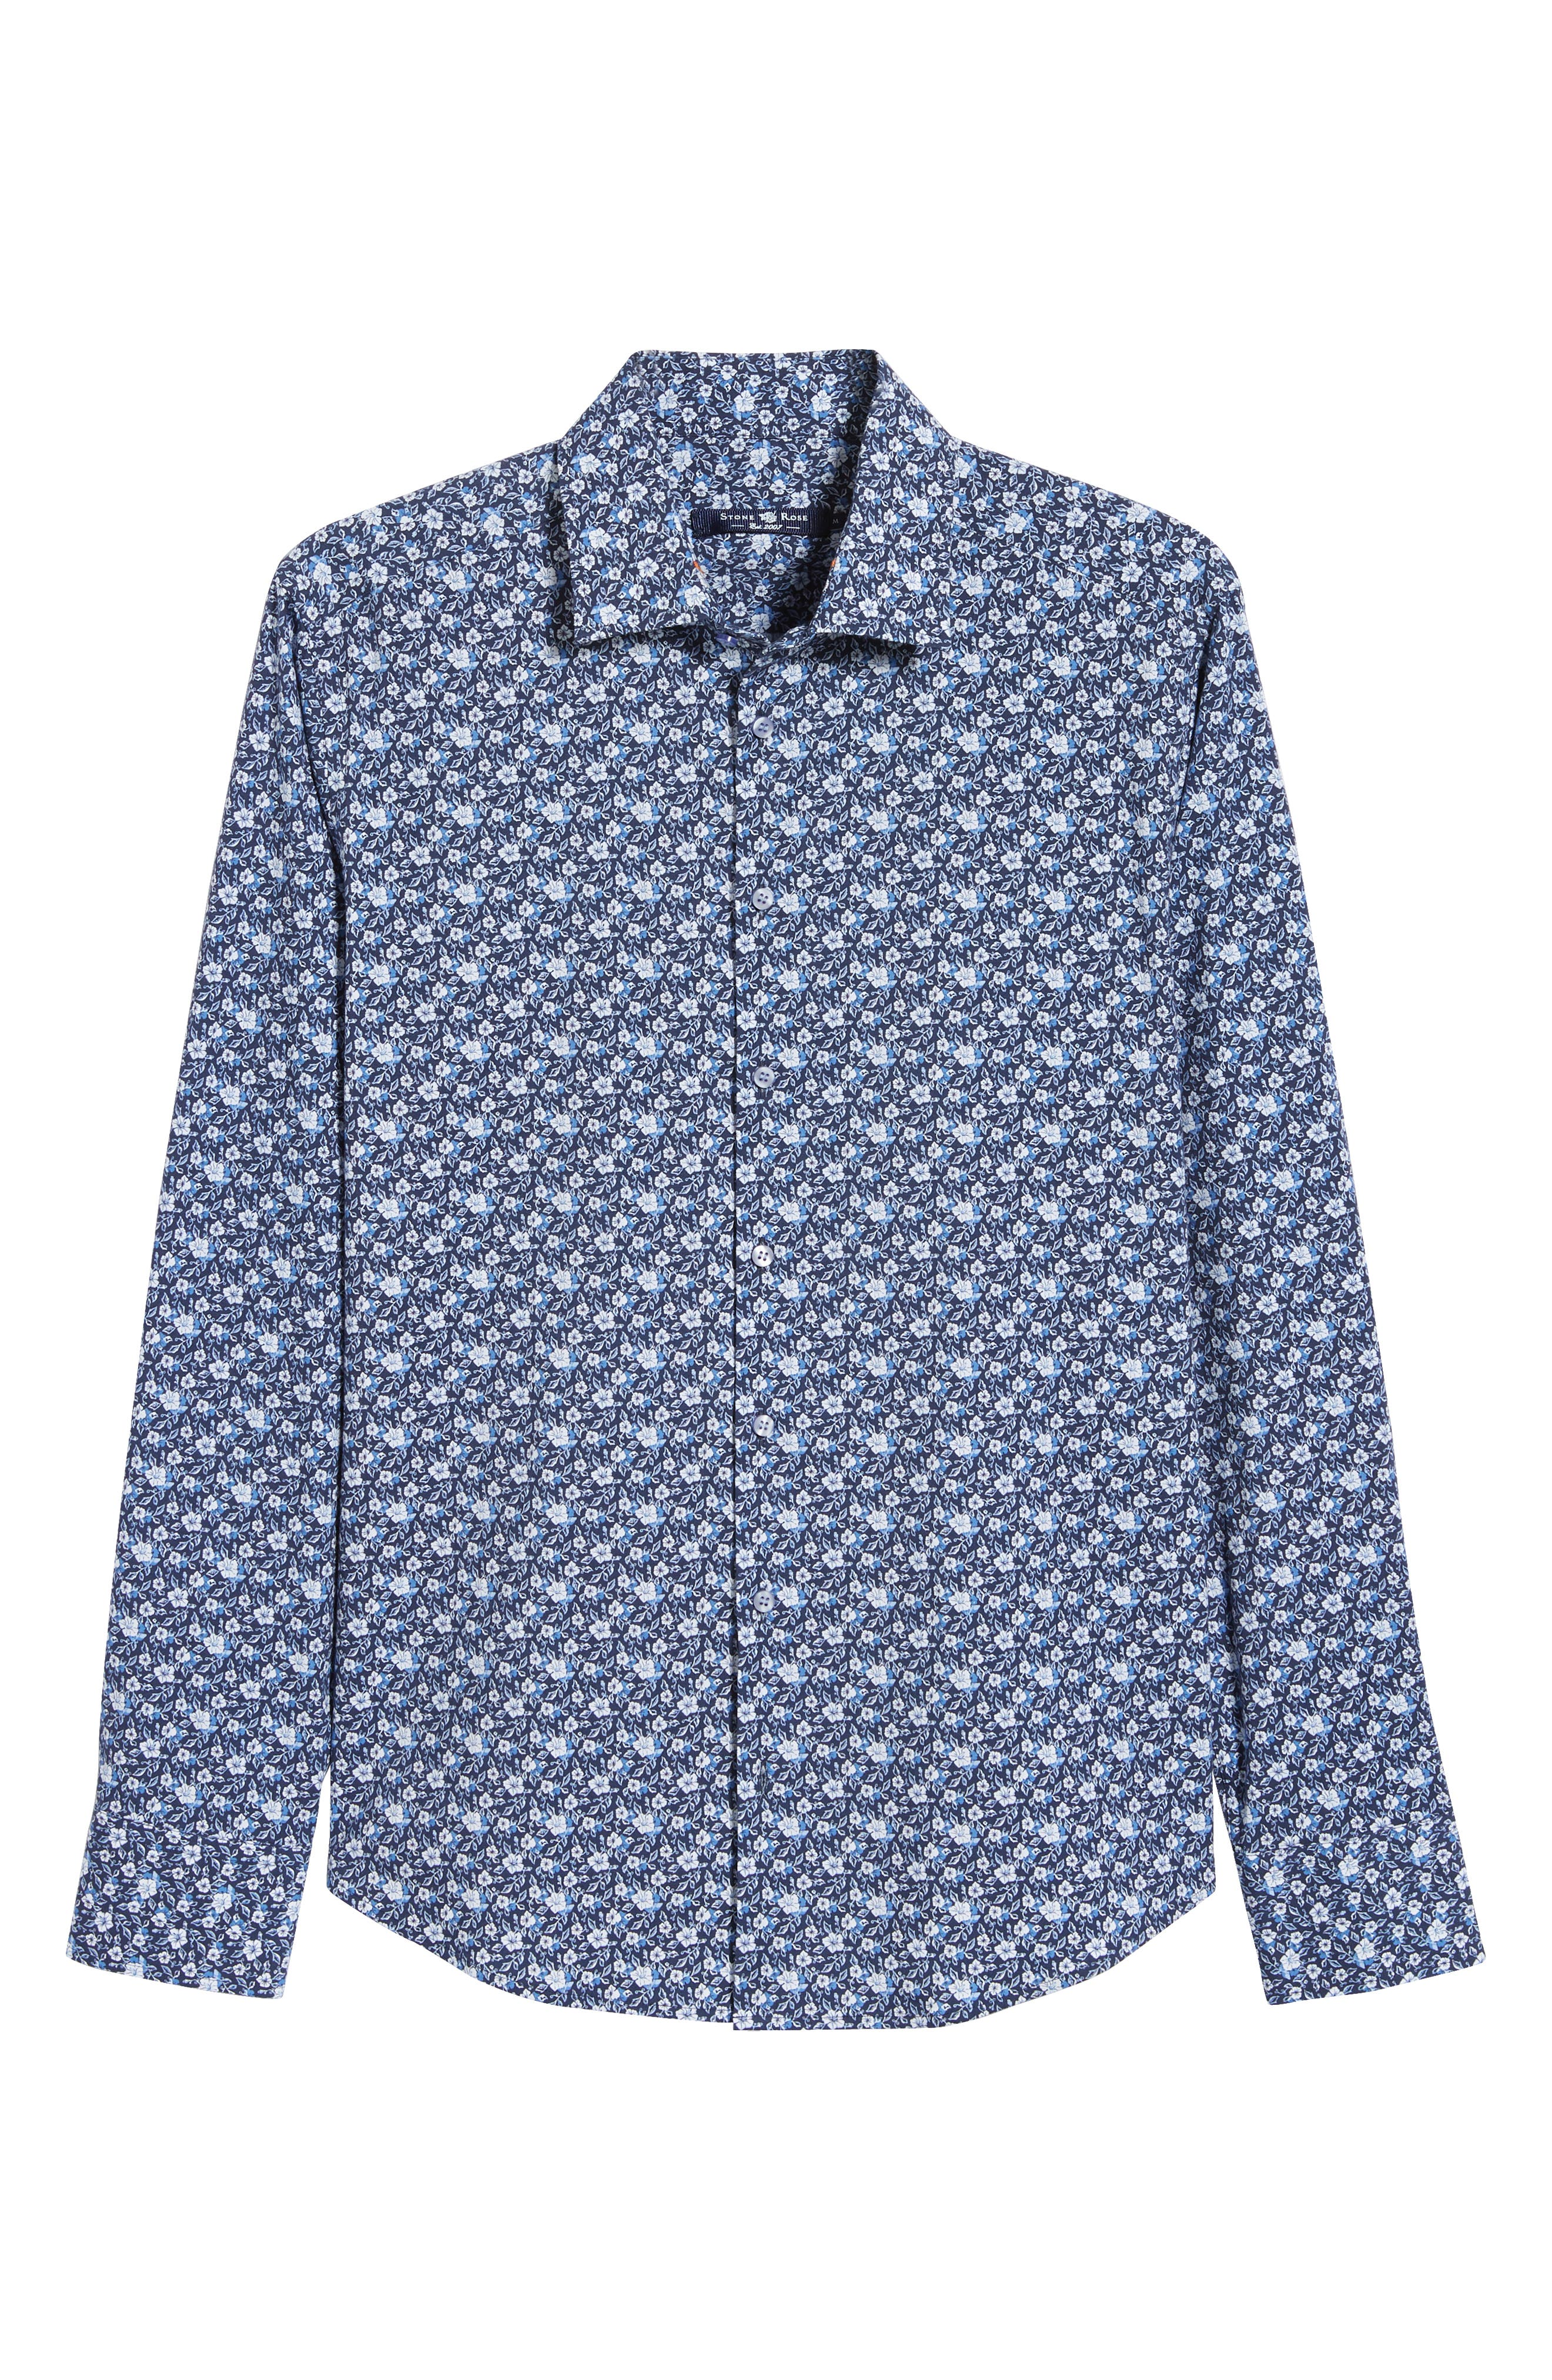 Regular Fit Floral Print Knit Sport Shirt,                             Alternate thumbnail 5, color,                             NAVY